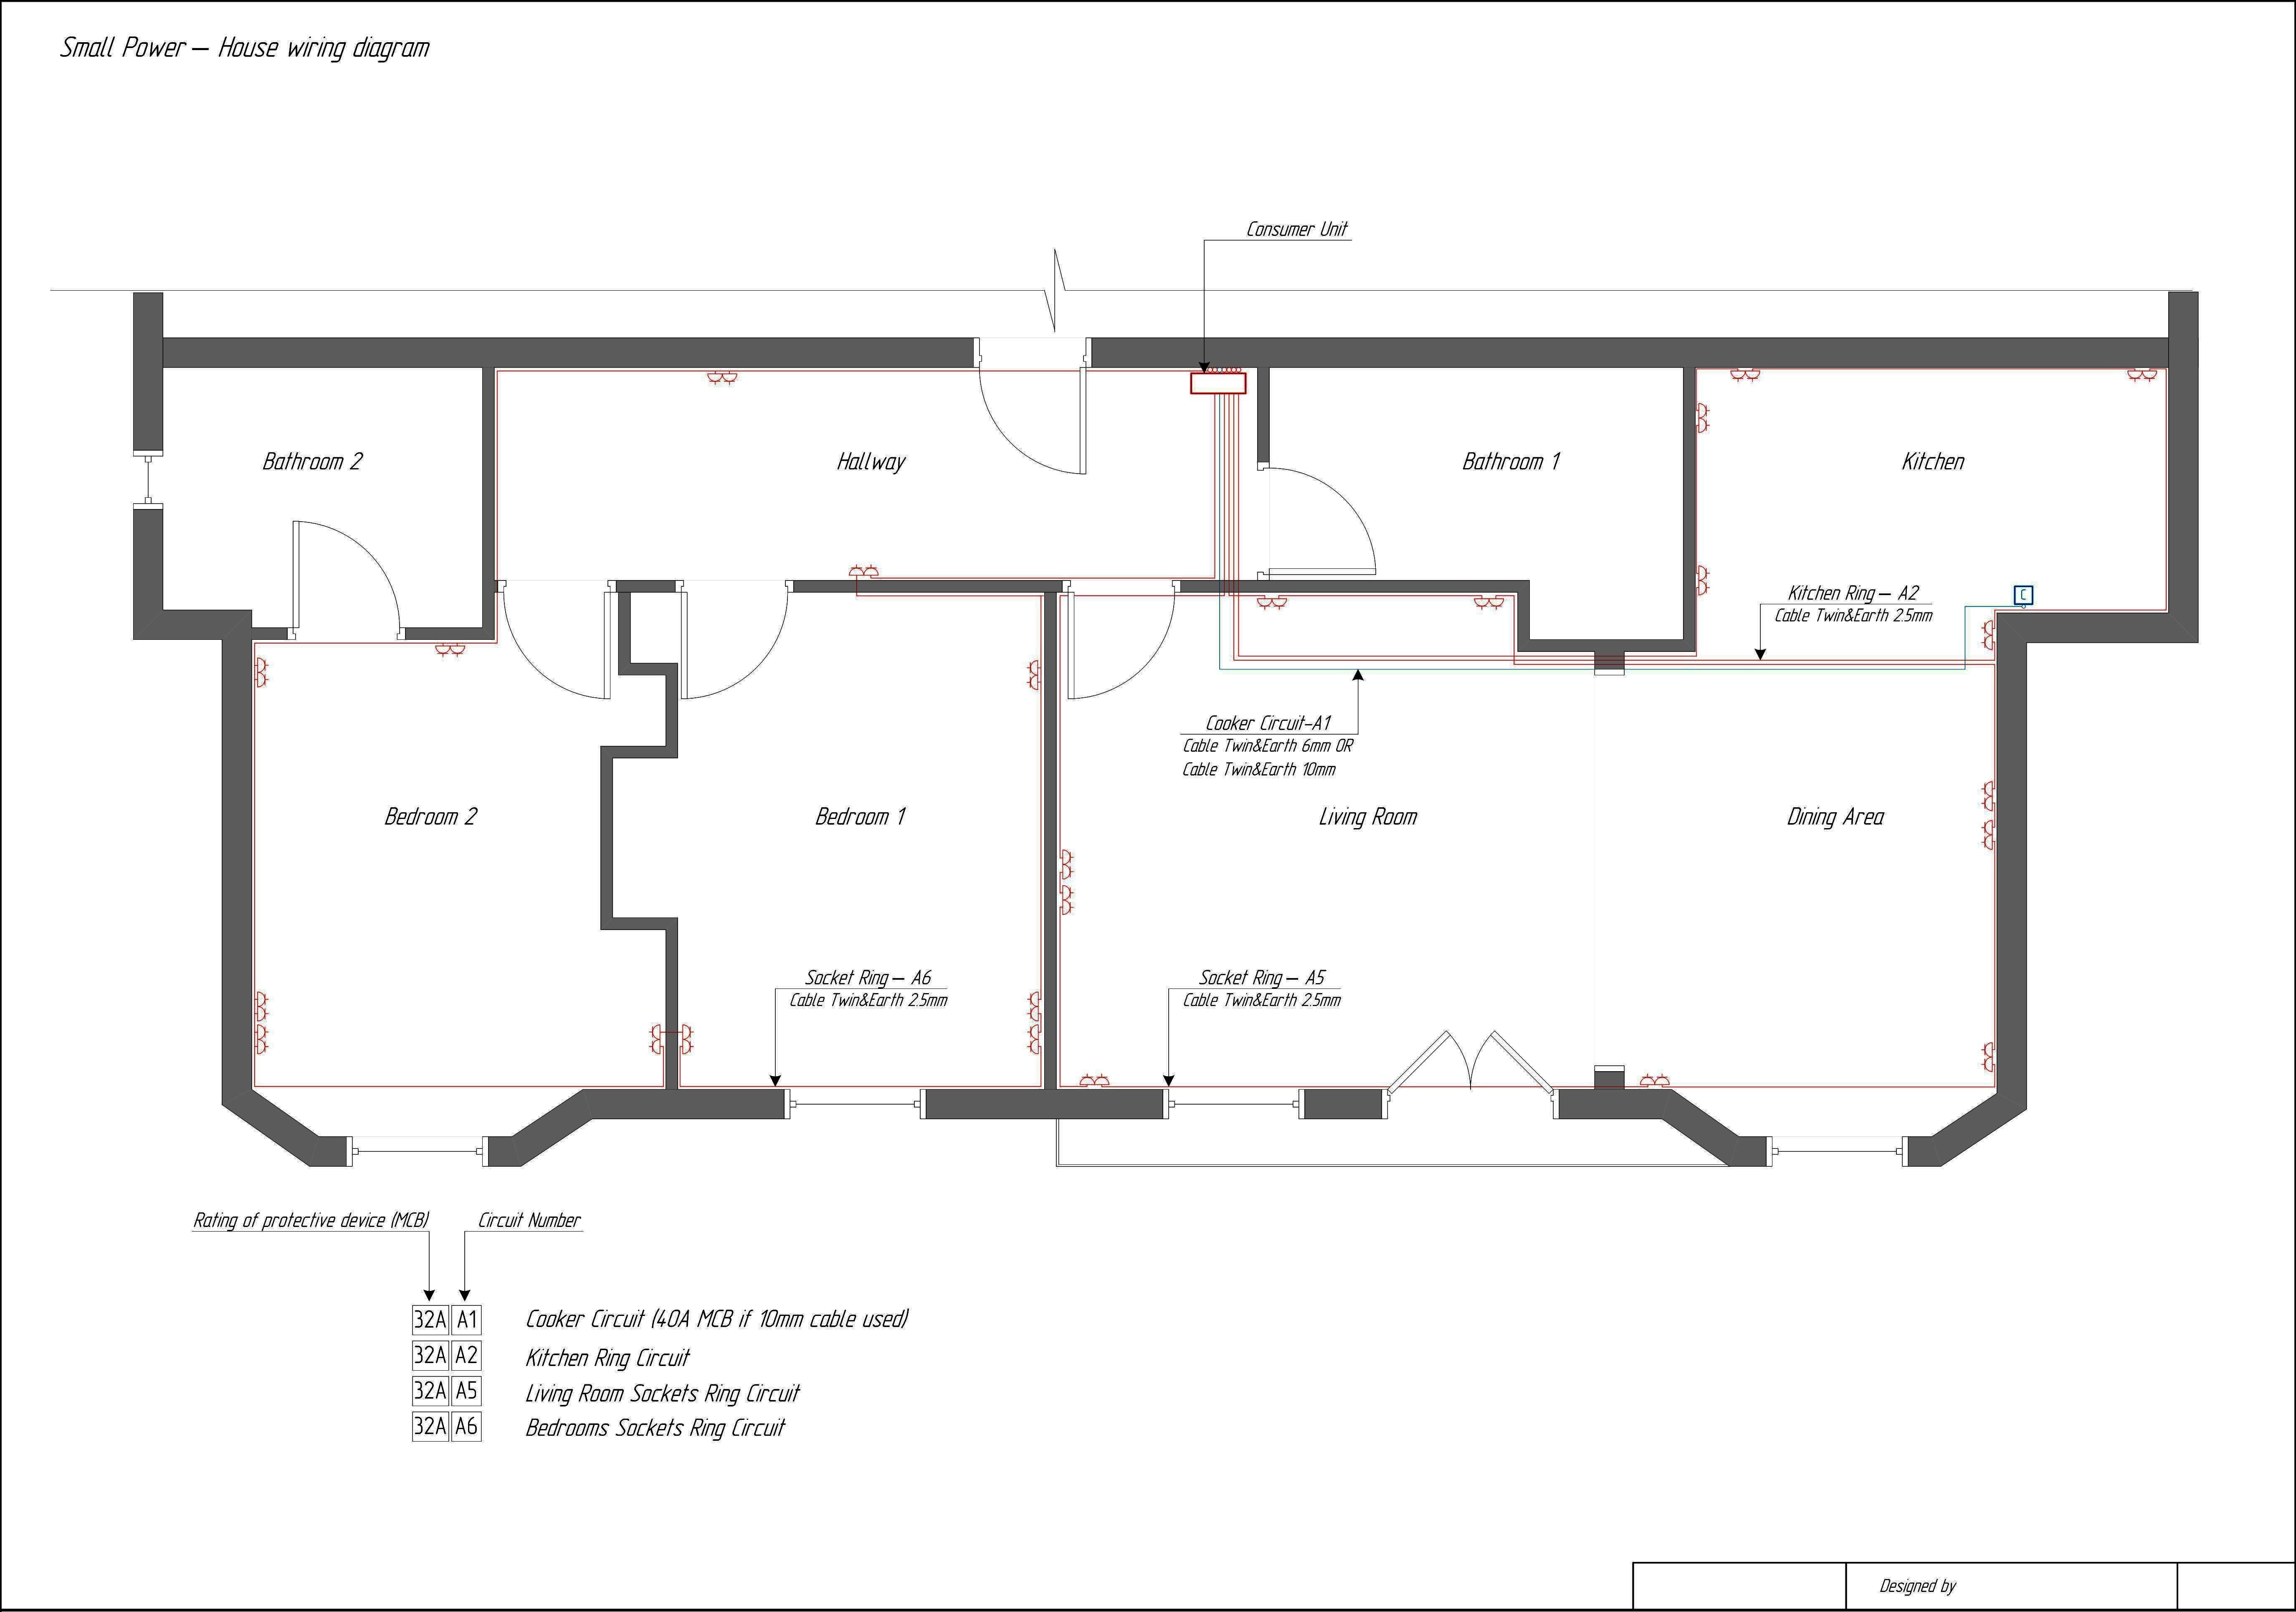 23 Great Ideas Of House Wiring Diagram Software Design Ideas Https Bacamajalah Com 23 Great House Wiring Electrical Circuit Diagram Home Electrical Wiring